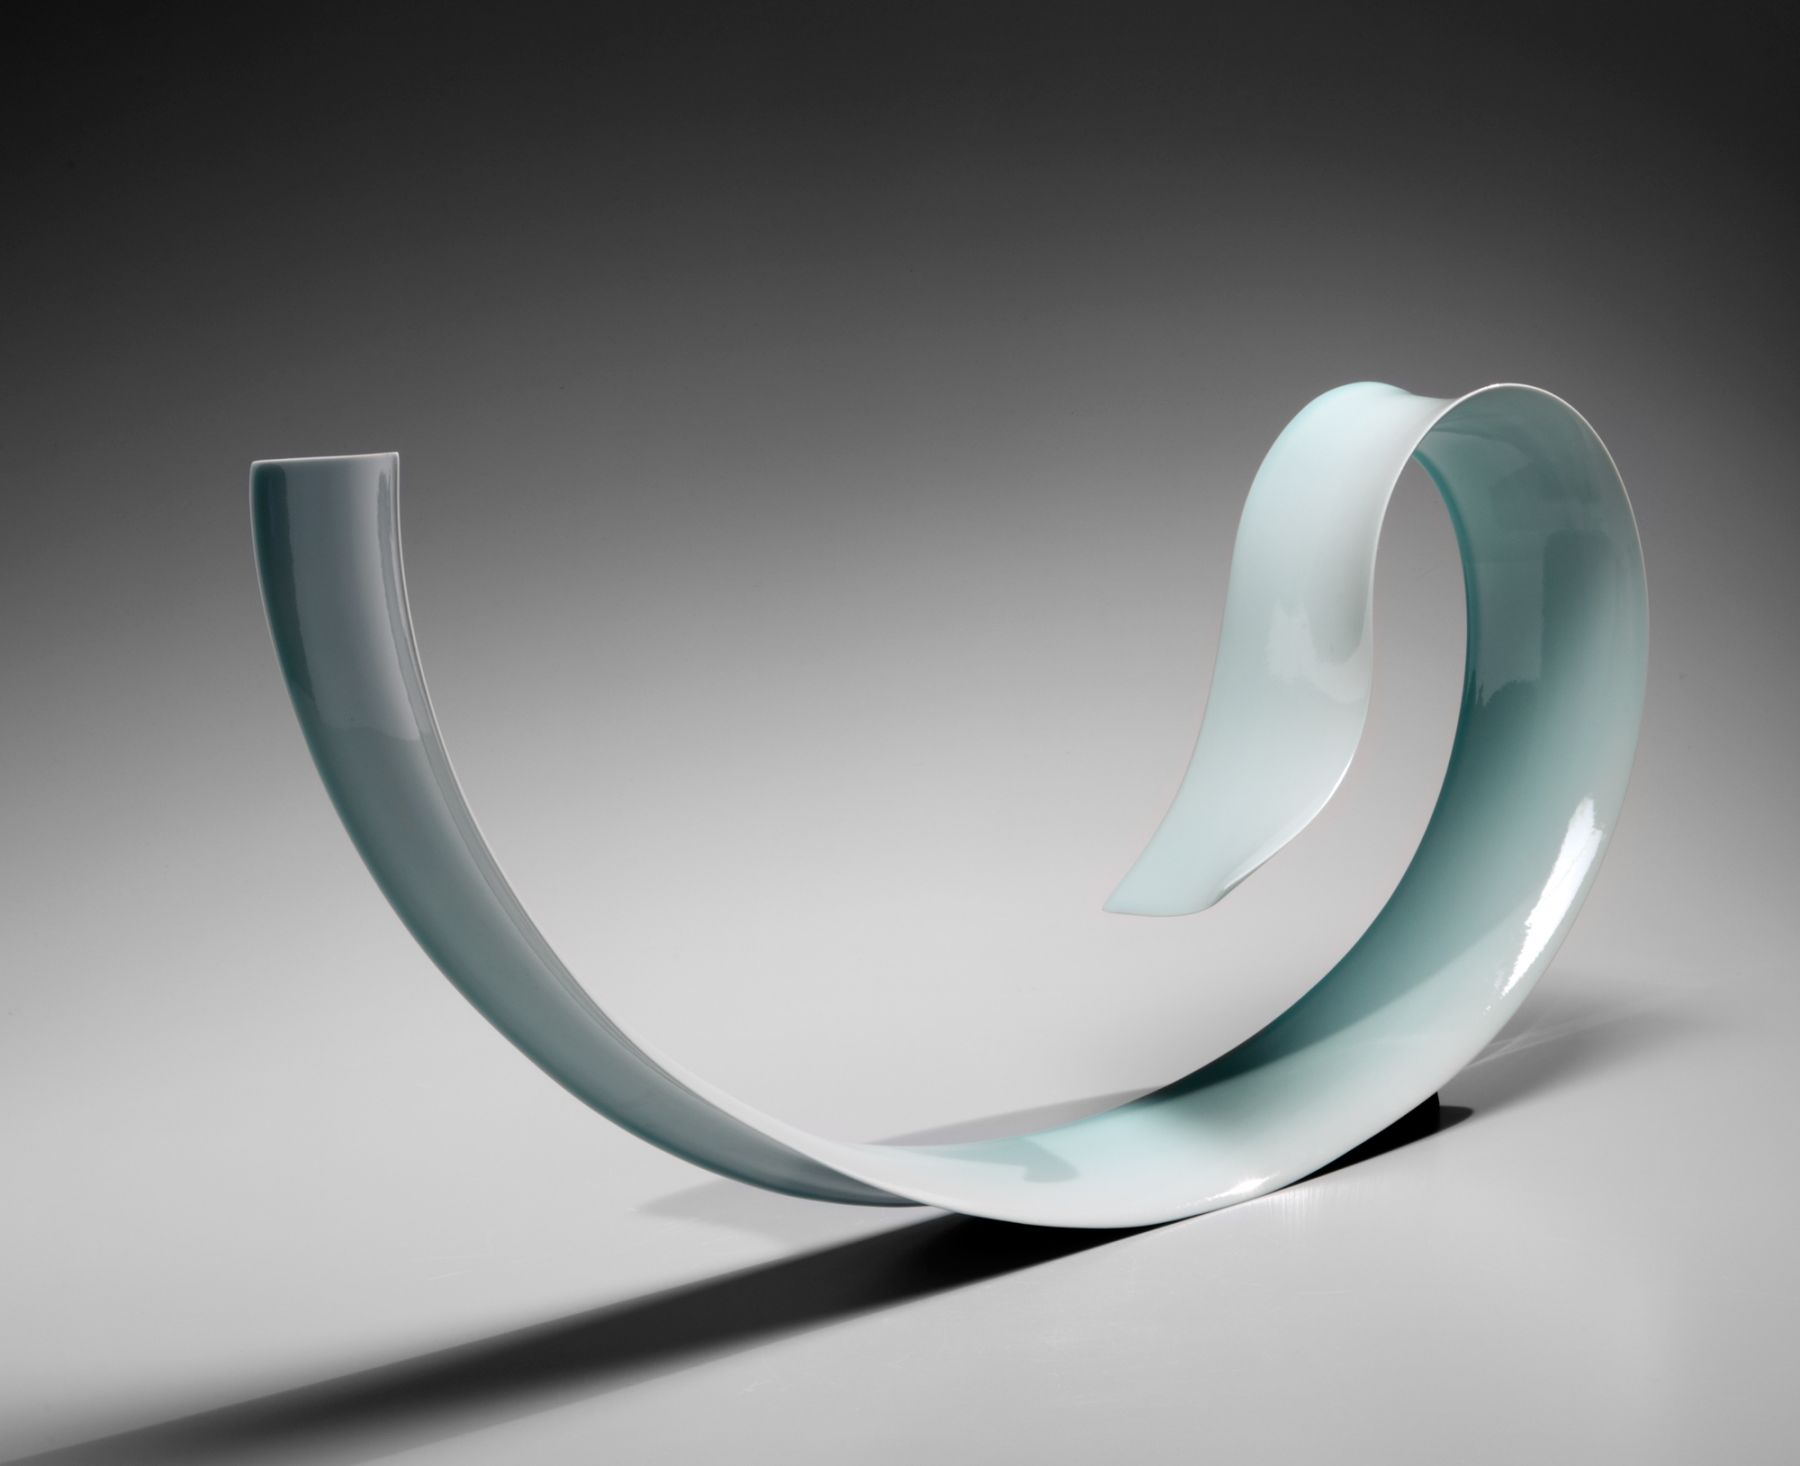 Kino Satoshi(b. 1987), Mountain Gust; Thin, elongated and curling ribbon-like sculpture